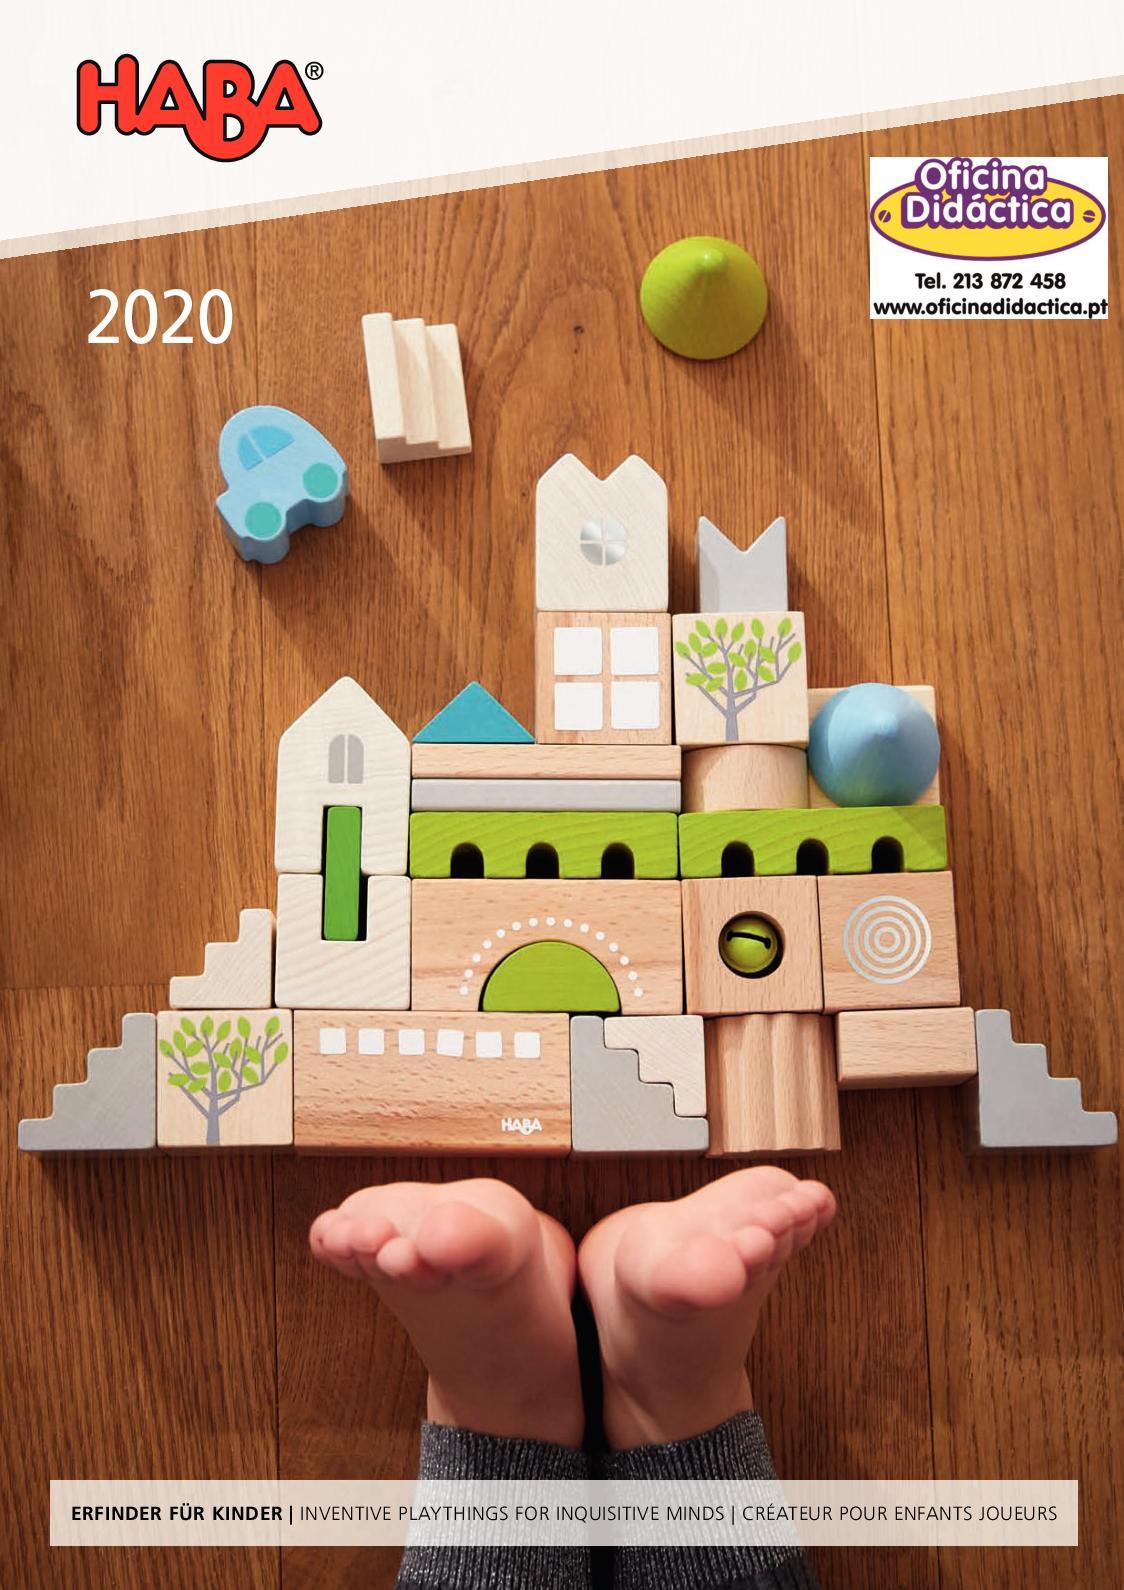 Calaméo - Haba - Catalogo 2020 dedans Ours Savant